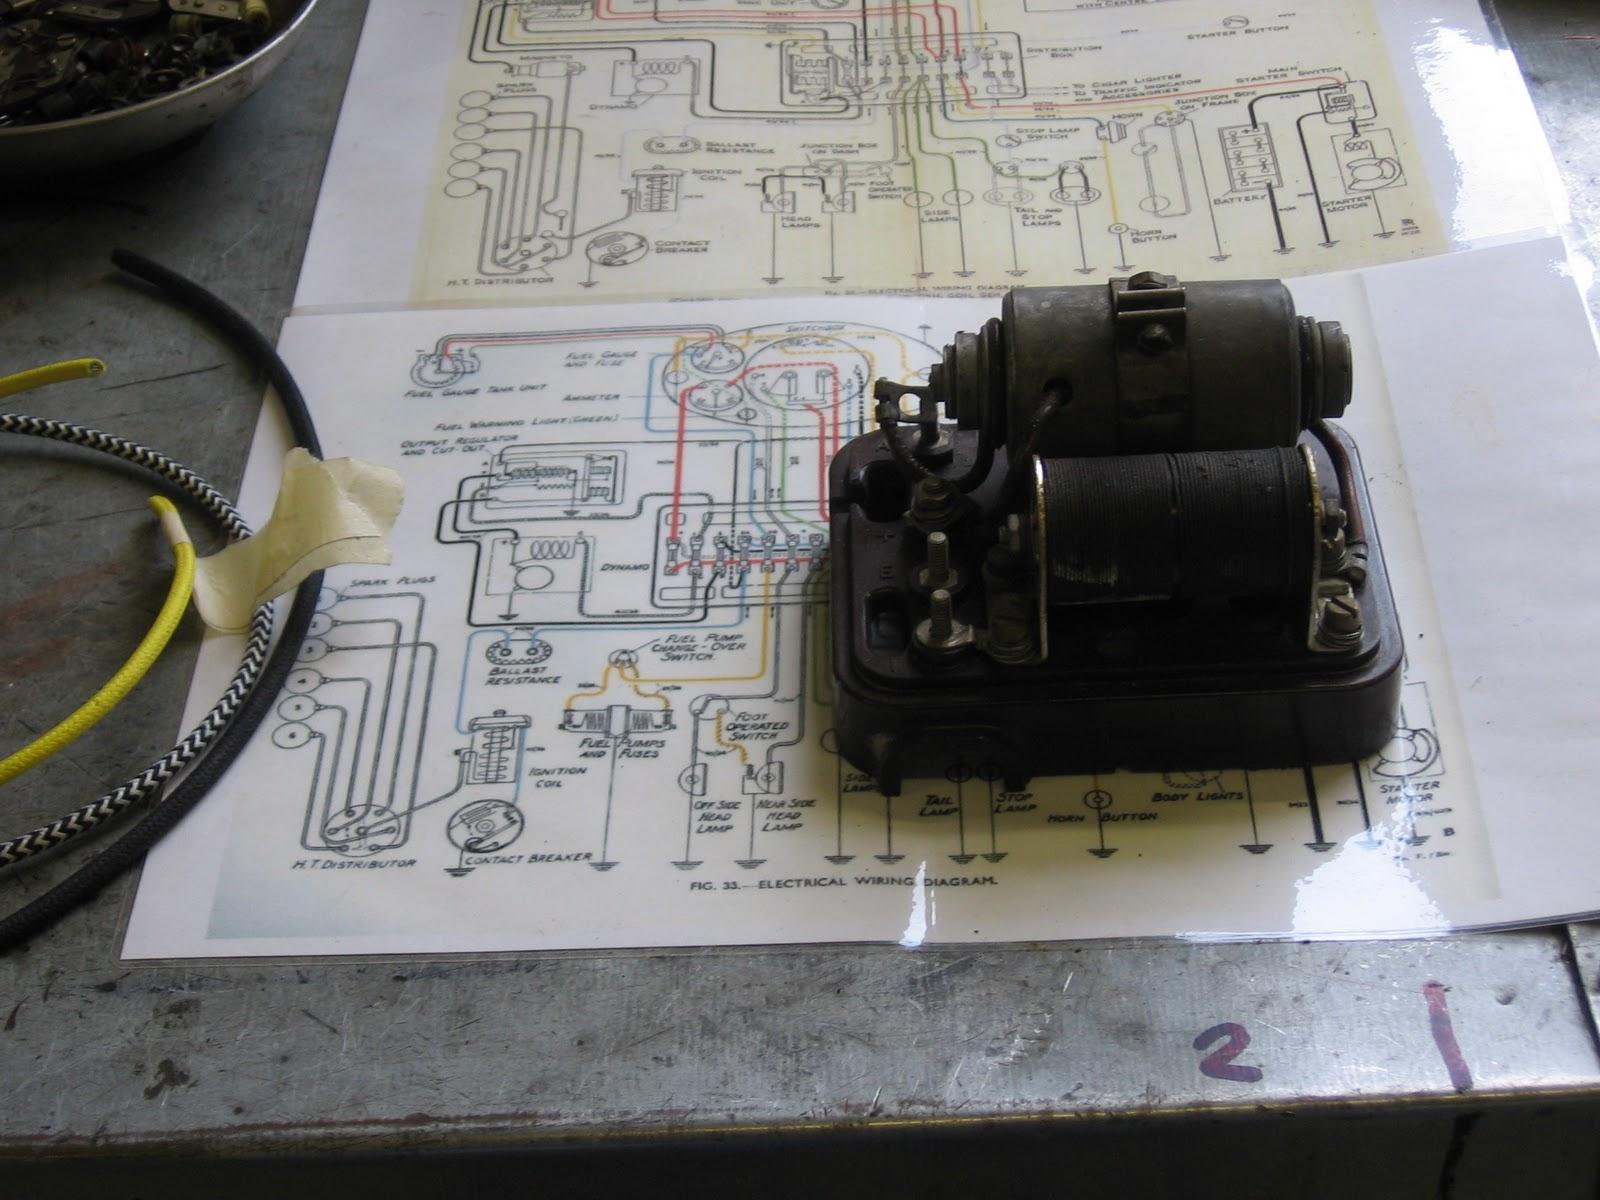 Bentley Wiring Diagram Schemes 2005 Arnage Milford Vintage Engineering Ltd Derby 4 1 Re Wire Rh Blogspot Com Continental Pdf Turbo R